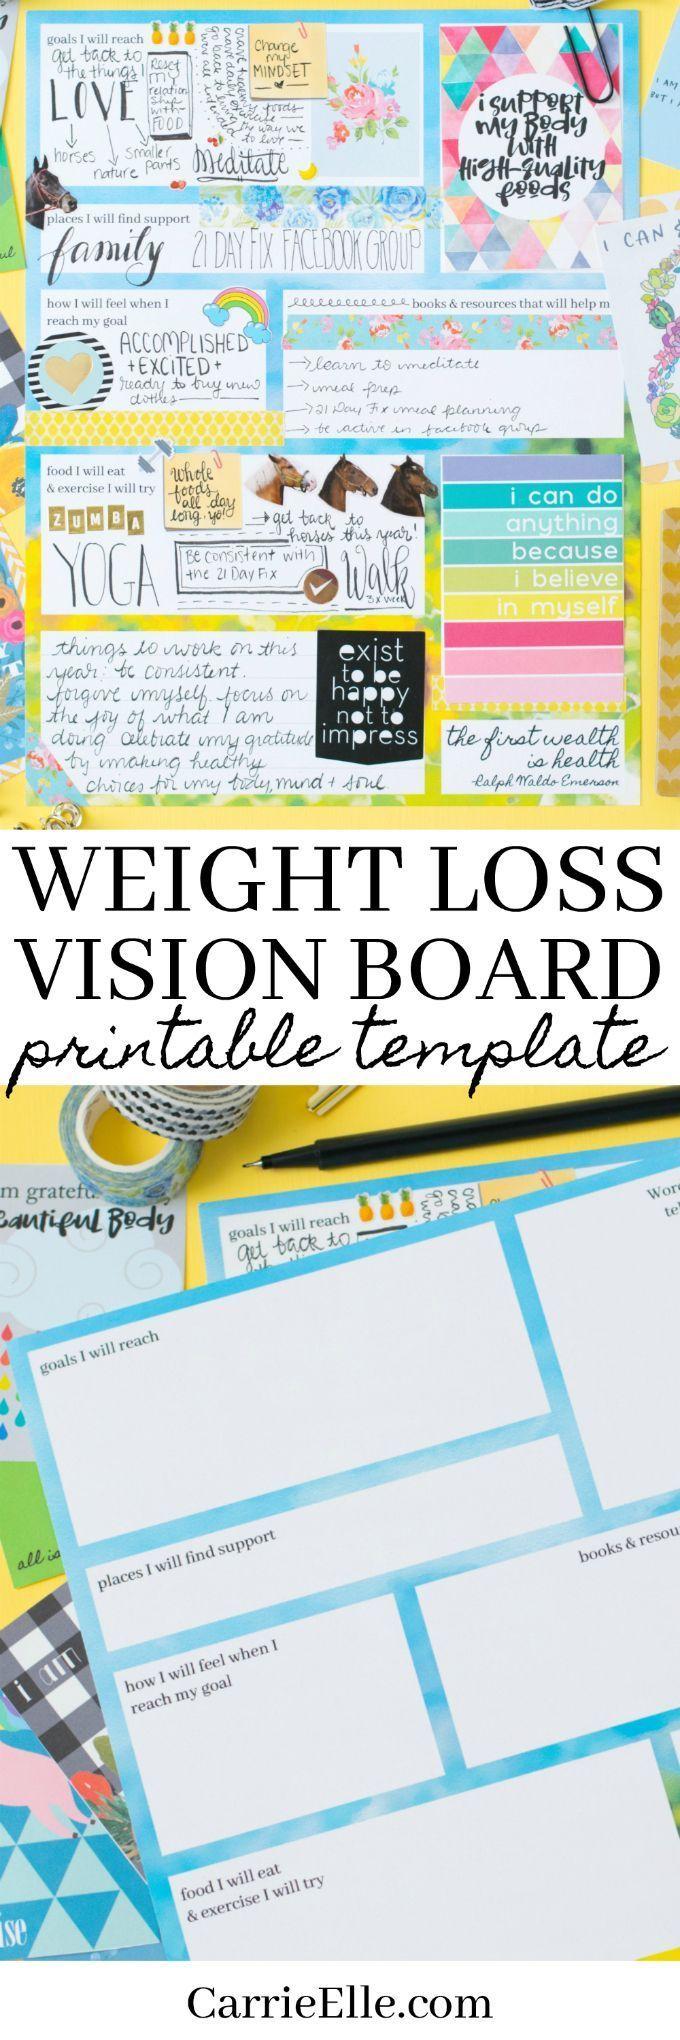 Best Vision Board Images On   Vision Boarding